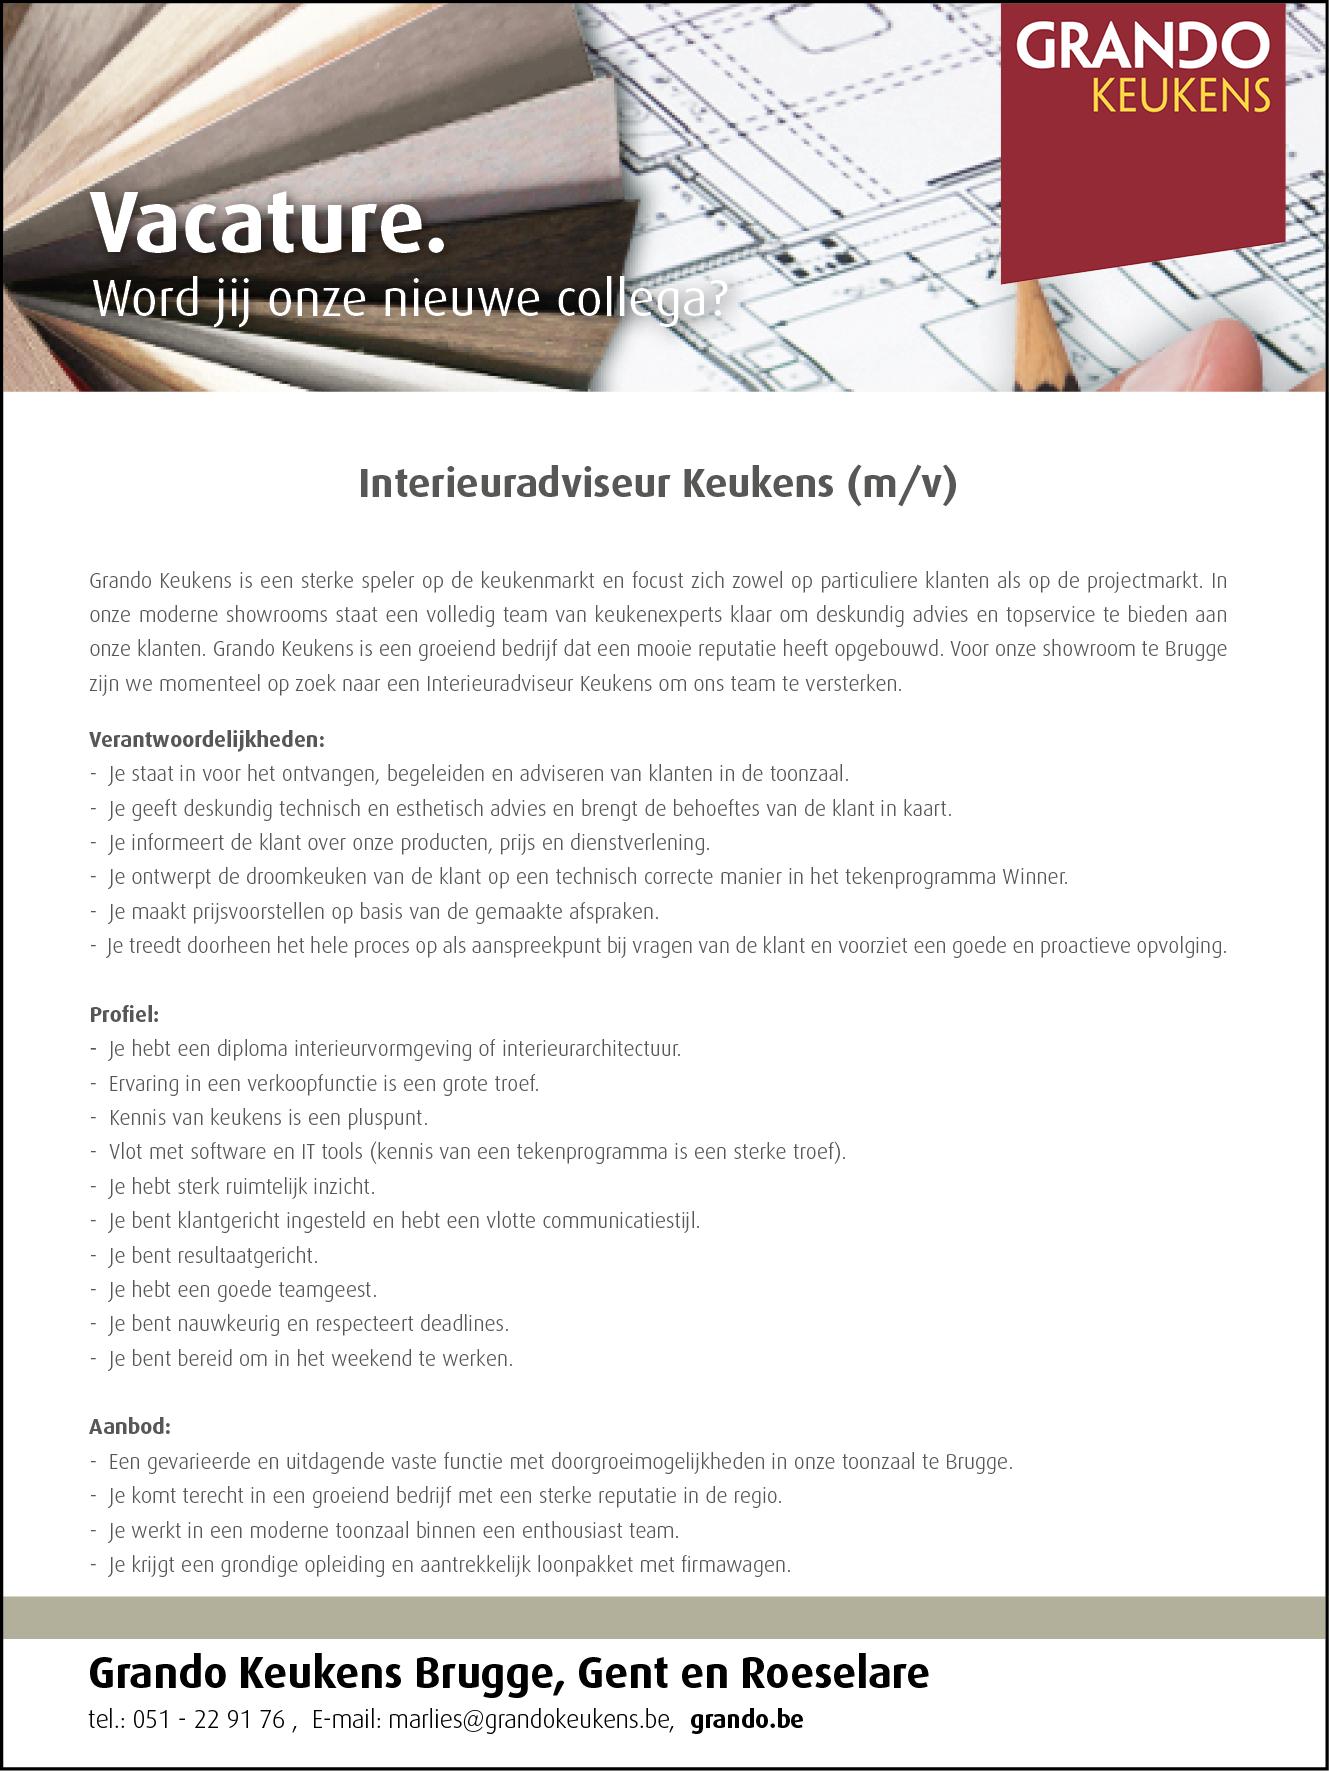 150x200 Vacature Lovanex Interieuradviseur keukens 2021_Brugge.png